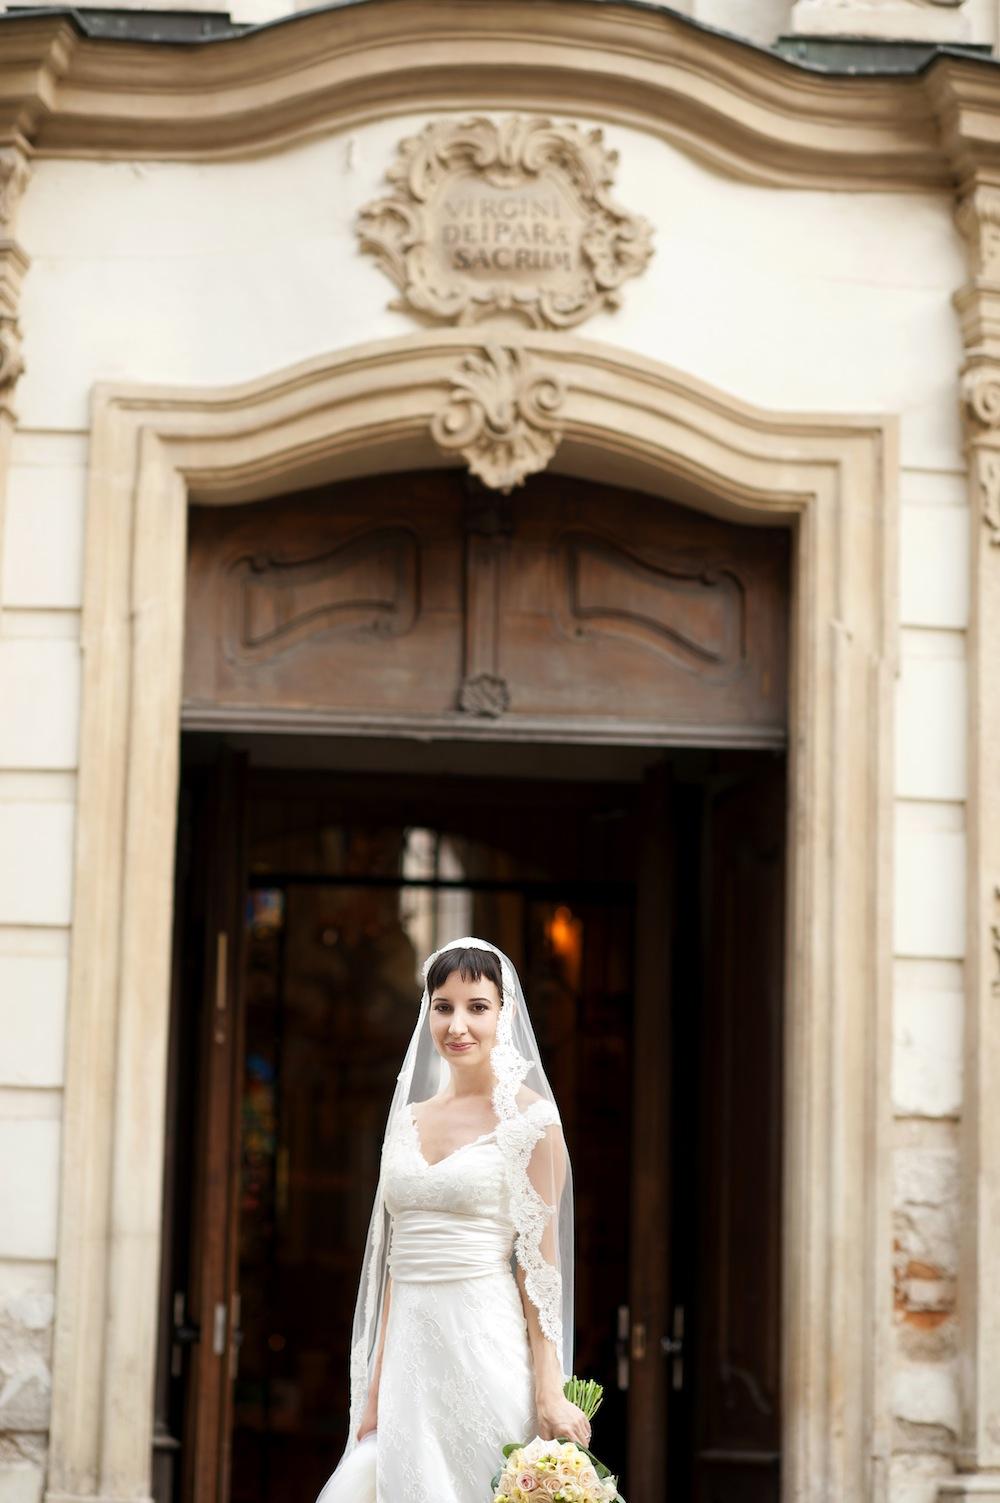 Jelana in Custom Gown